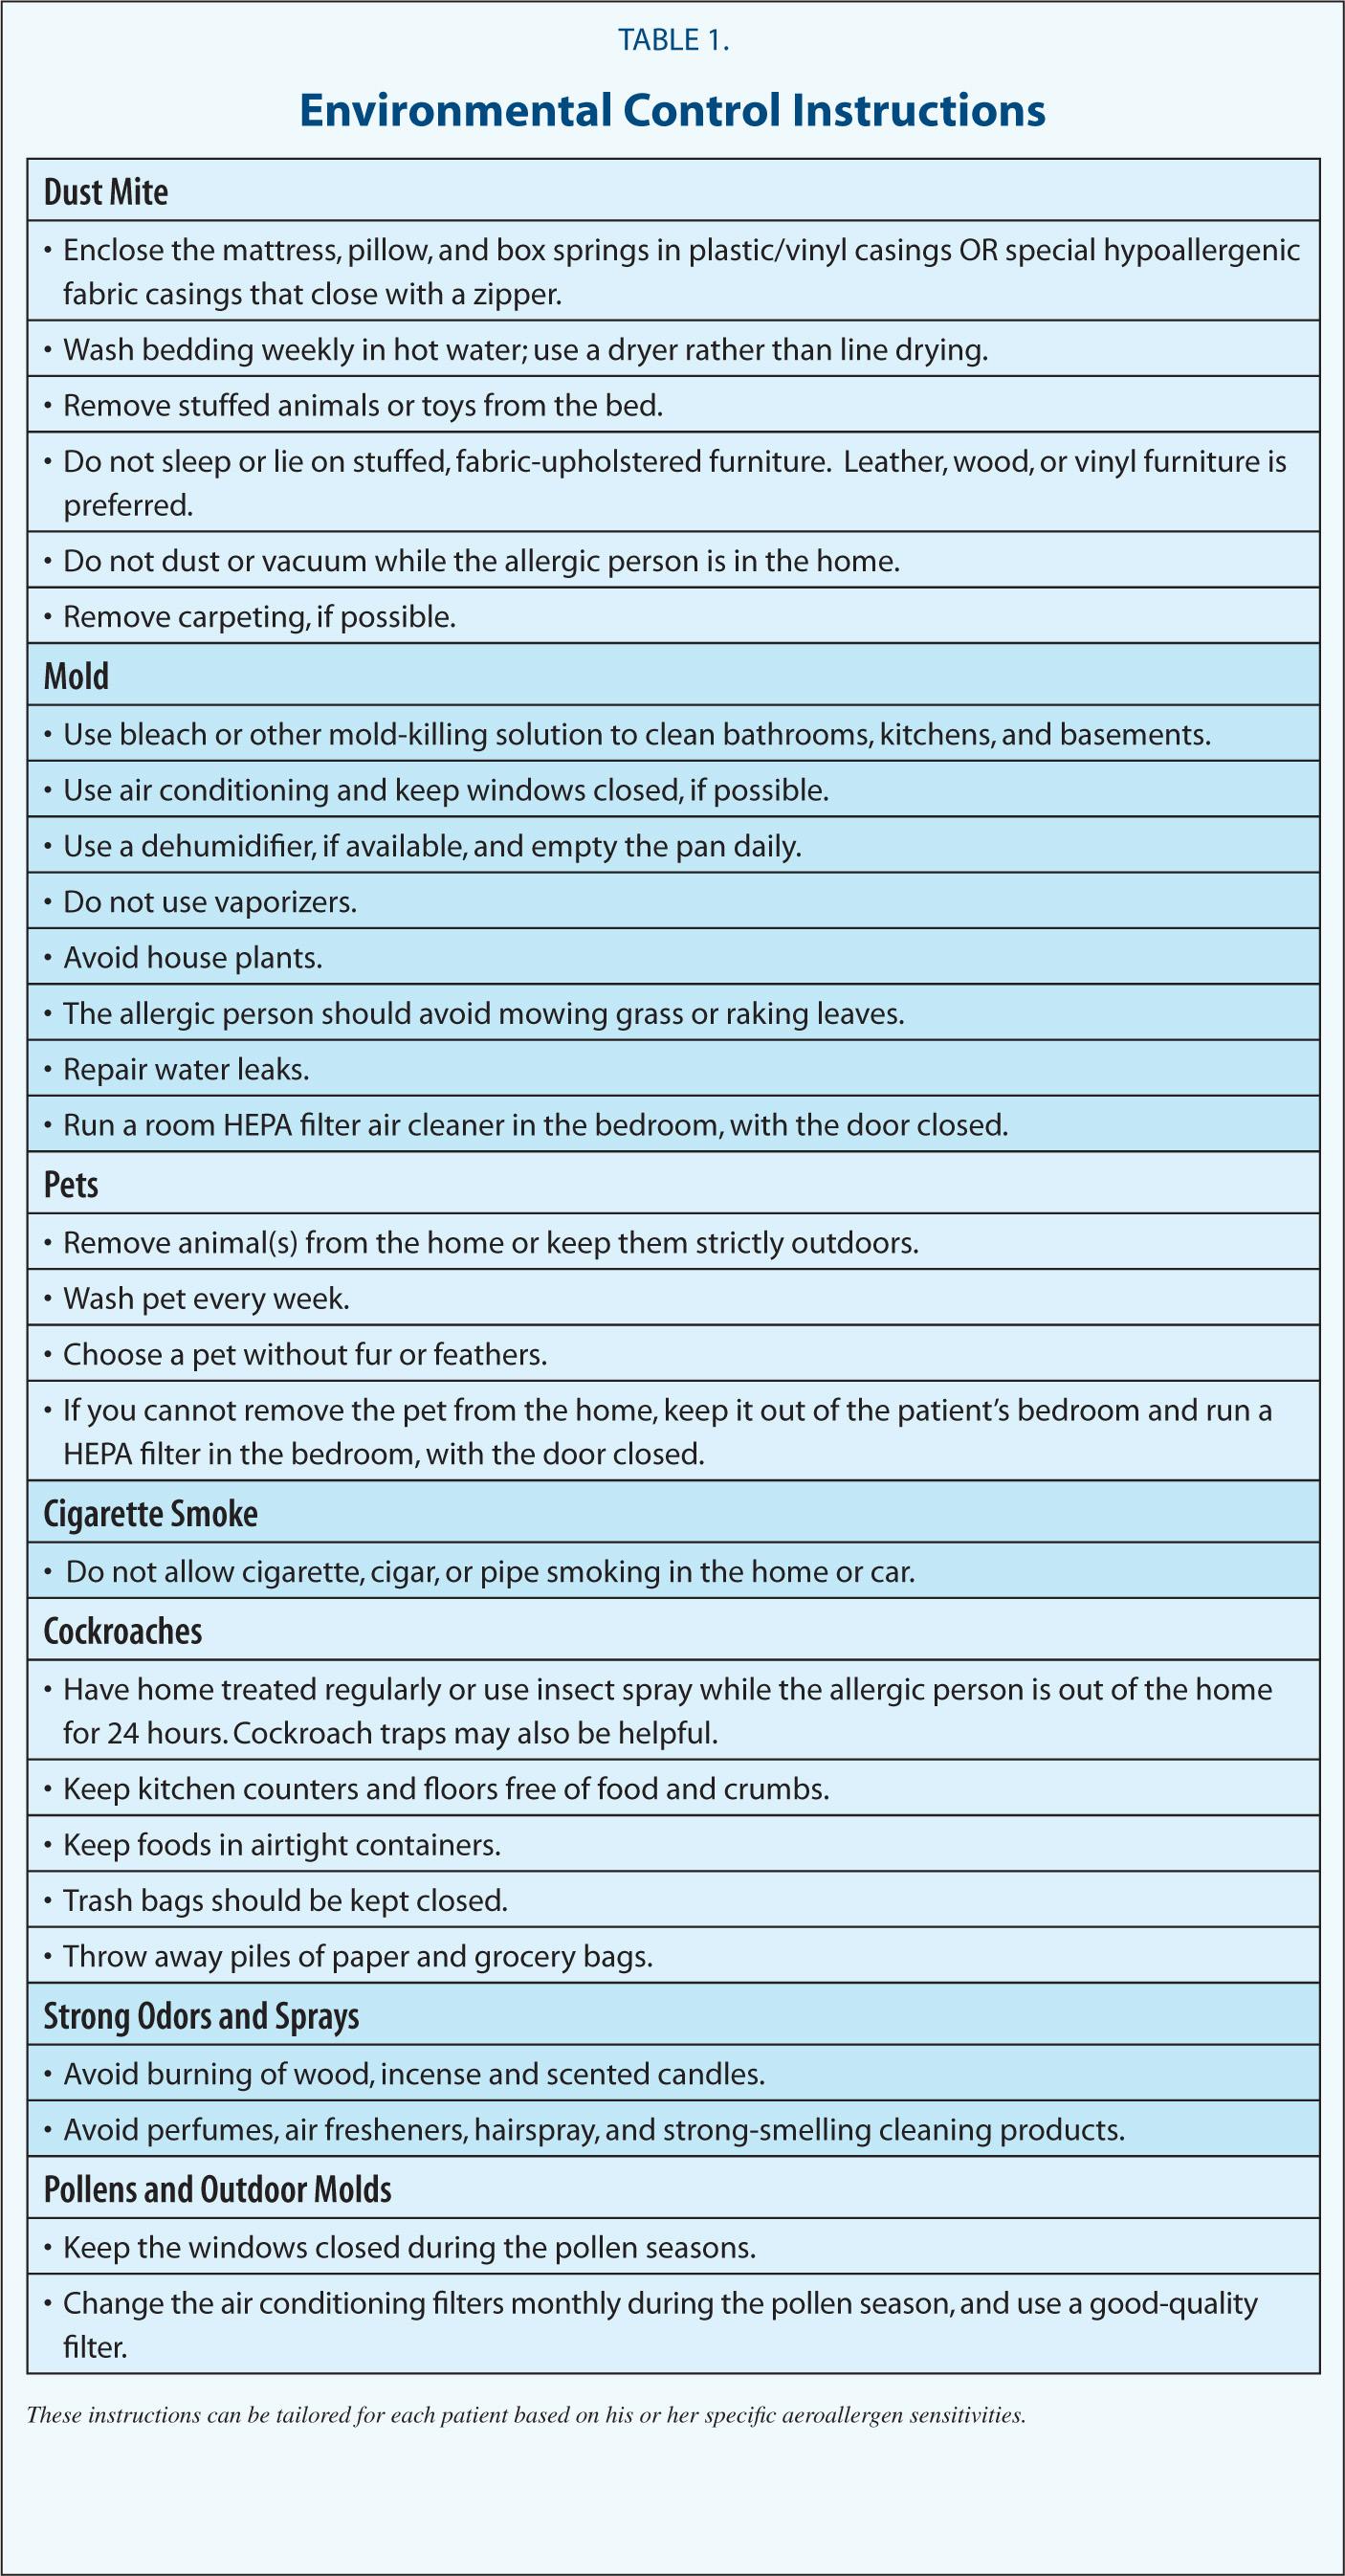 Environmental Control Instructions